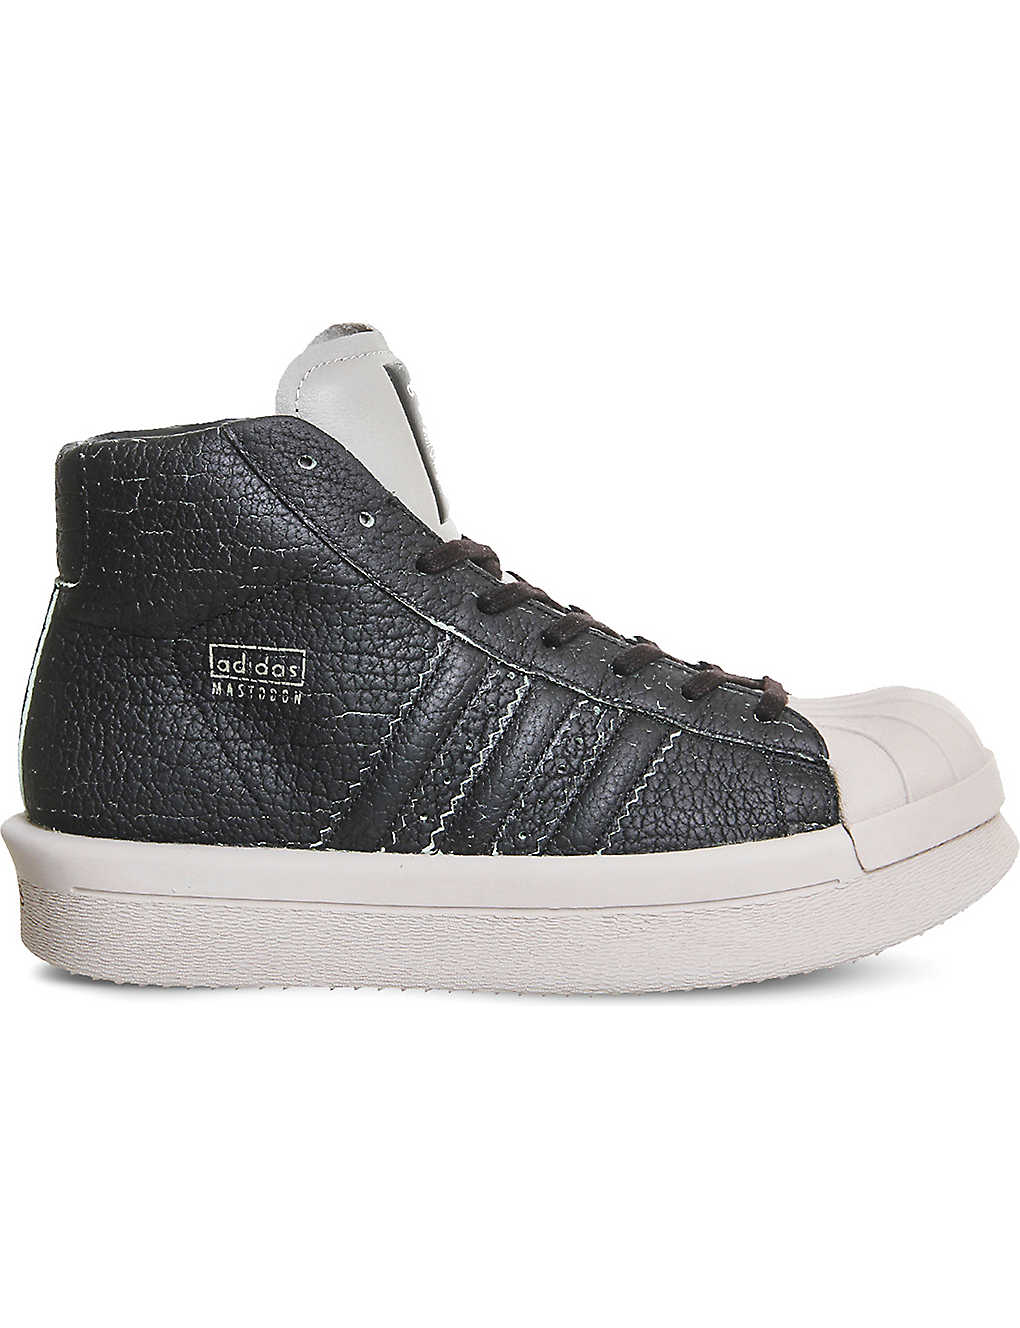 hot sales ca7a5 48b20 ADIDAS X RICK OWENS adidas x Rick Owens Mastodon Pro Model leather trainers